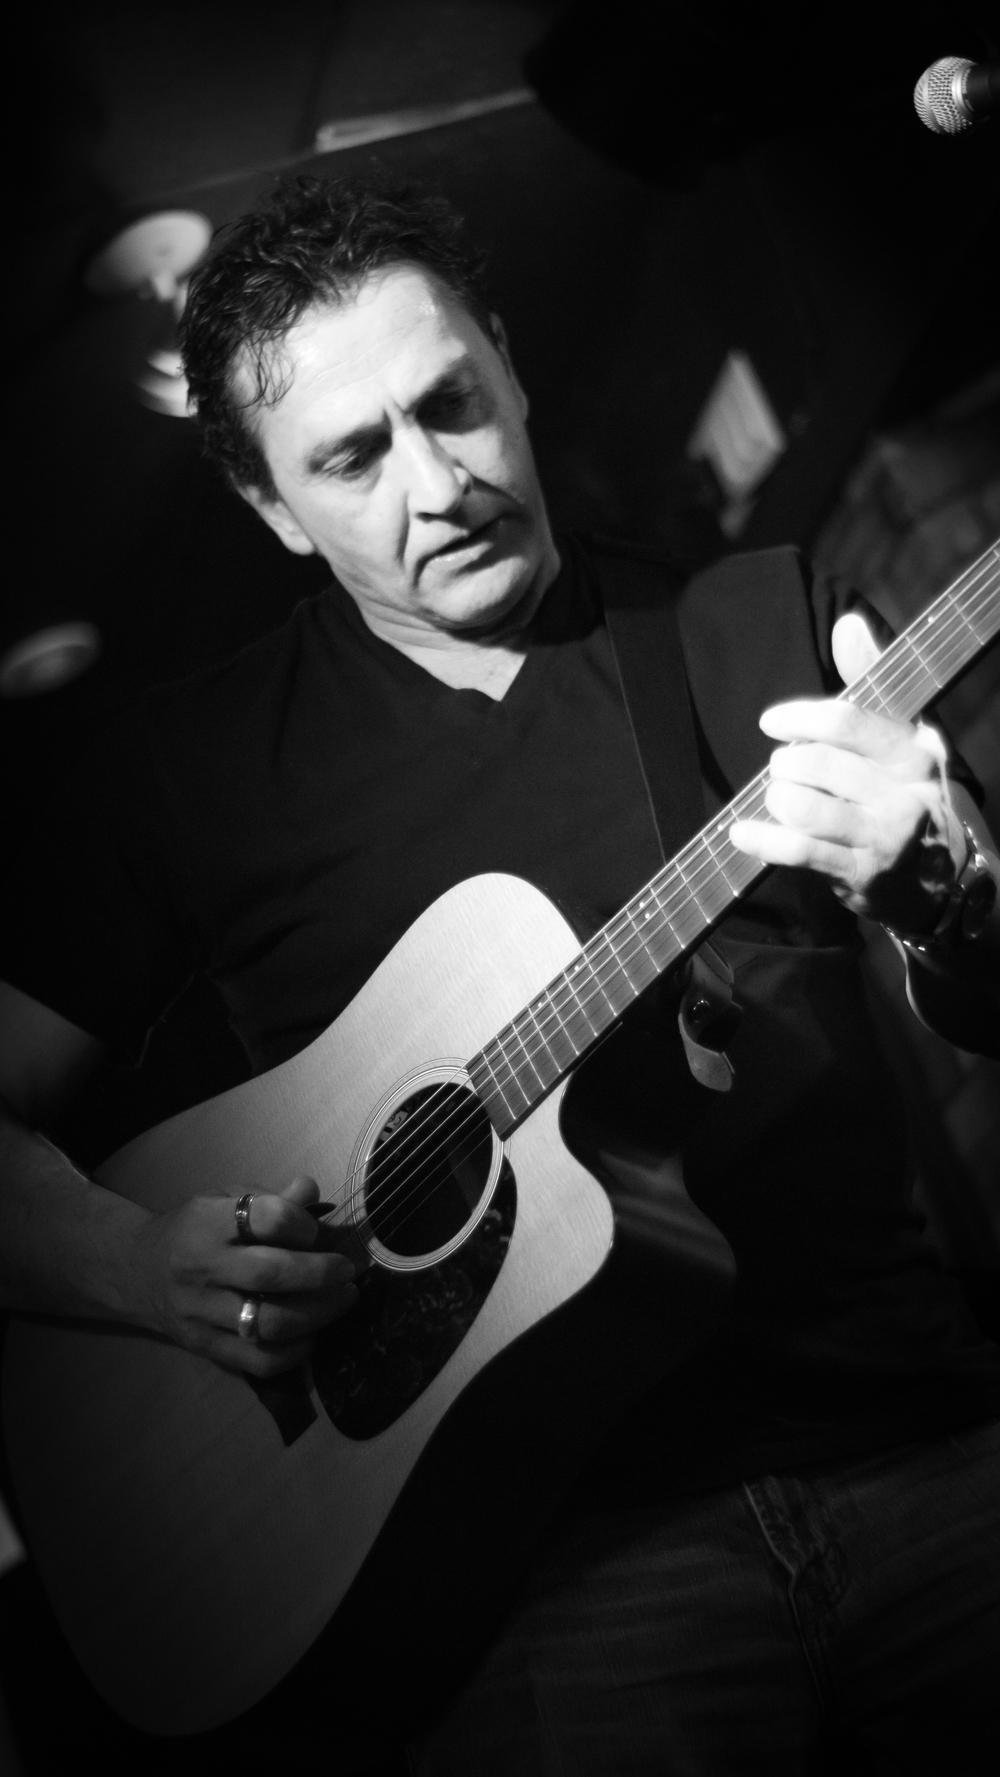 Tony Paglia